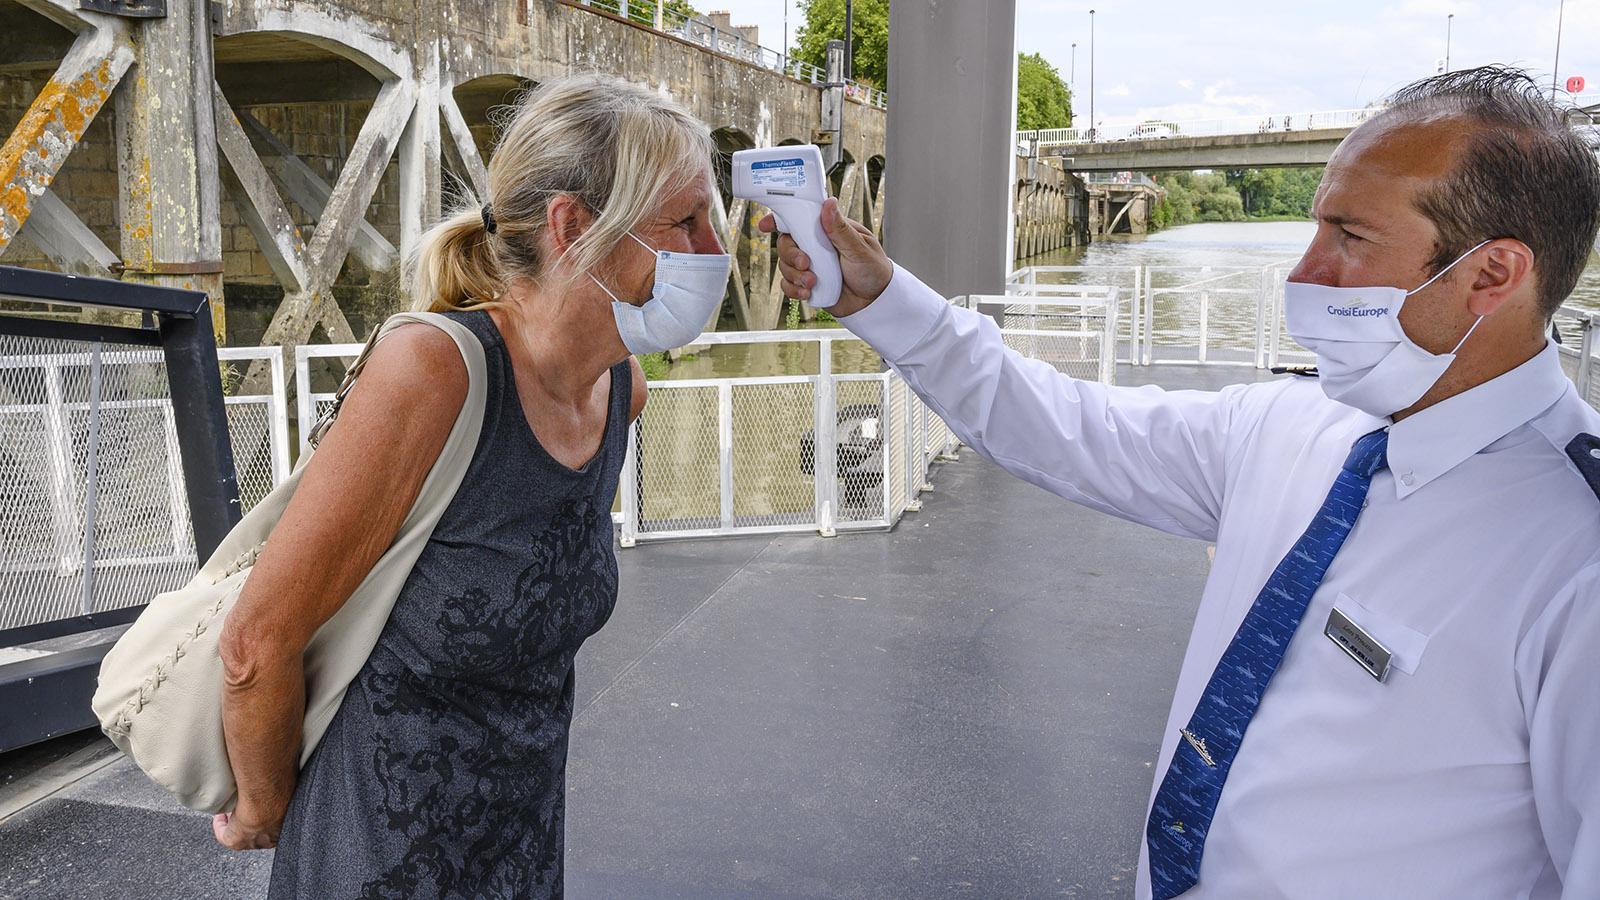 MS Loire Princesse, Temperaturkontrolle. Hilke Maunder